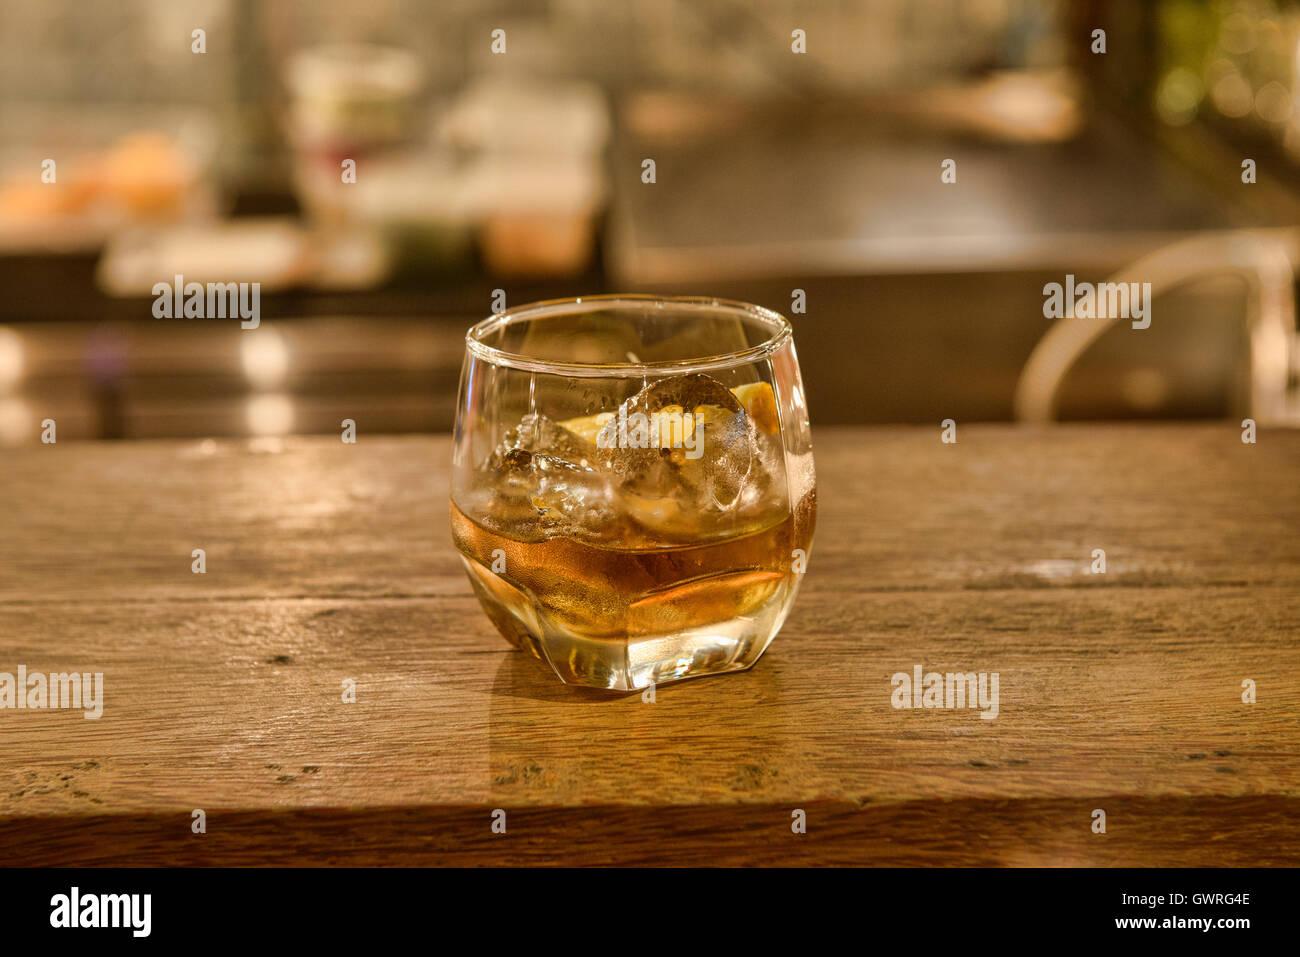 Shot de ya dong (Thai alcools blancs avec des plantes médicinales) dans un bar à Bangkok, Thaïlande Photo Stock